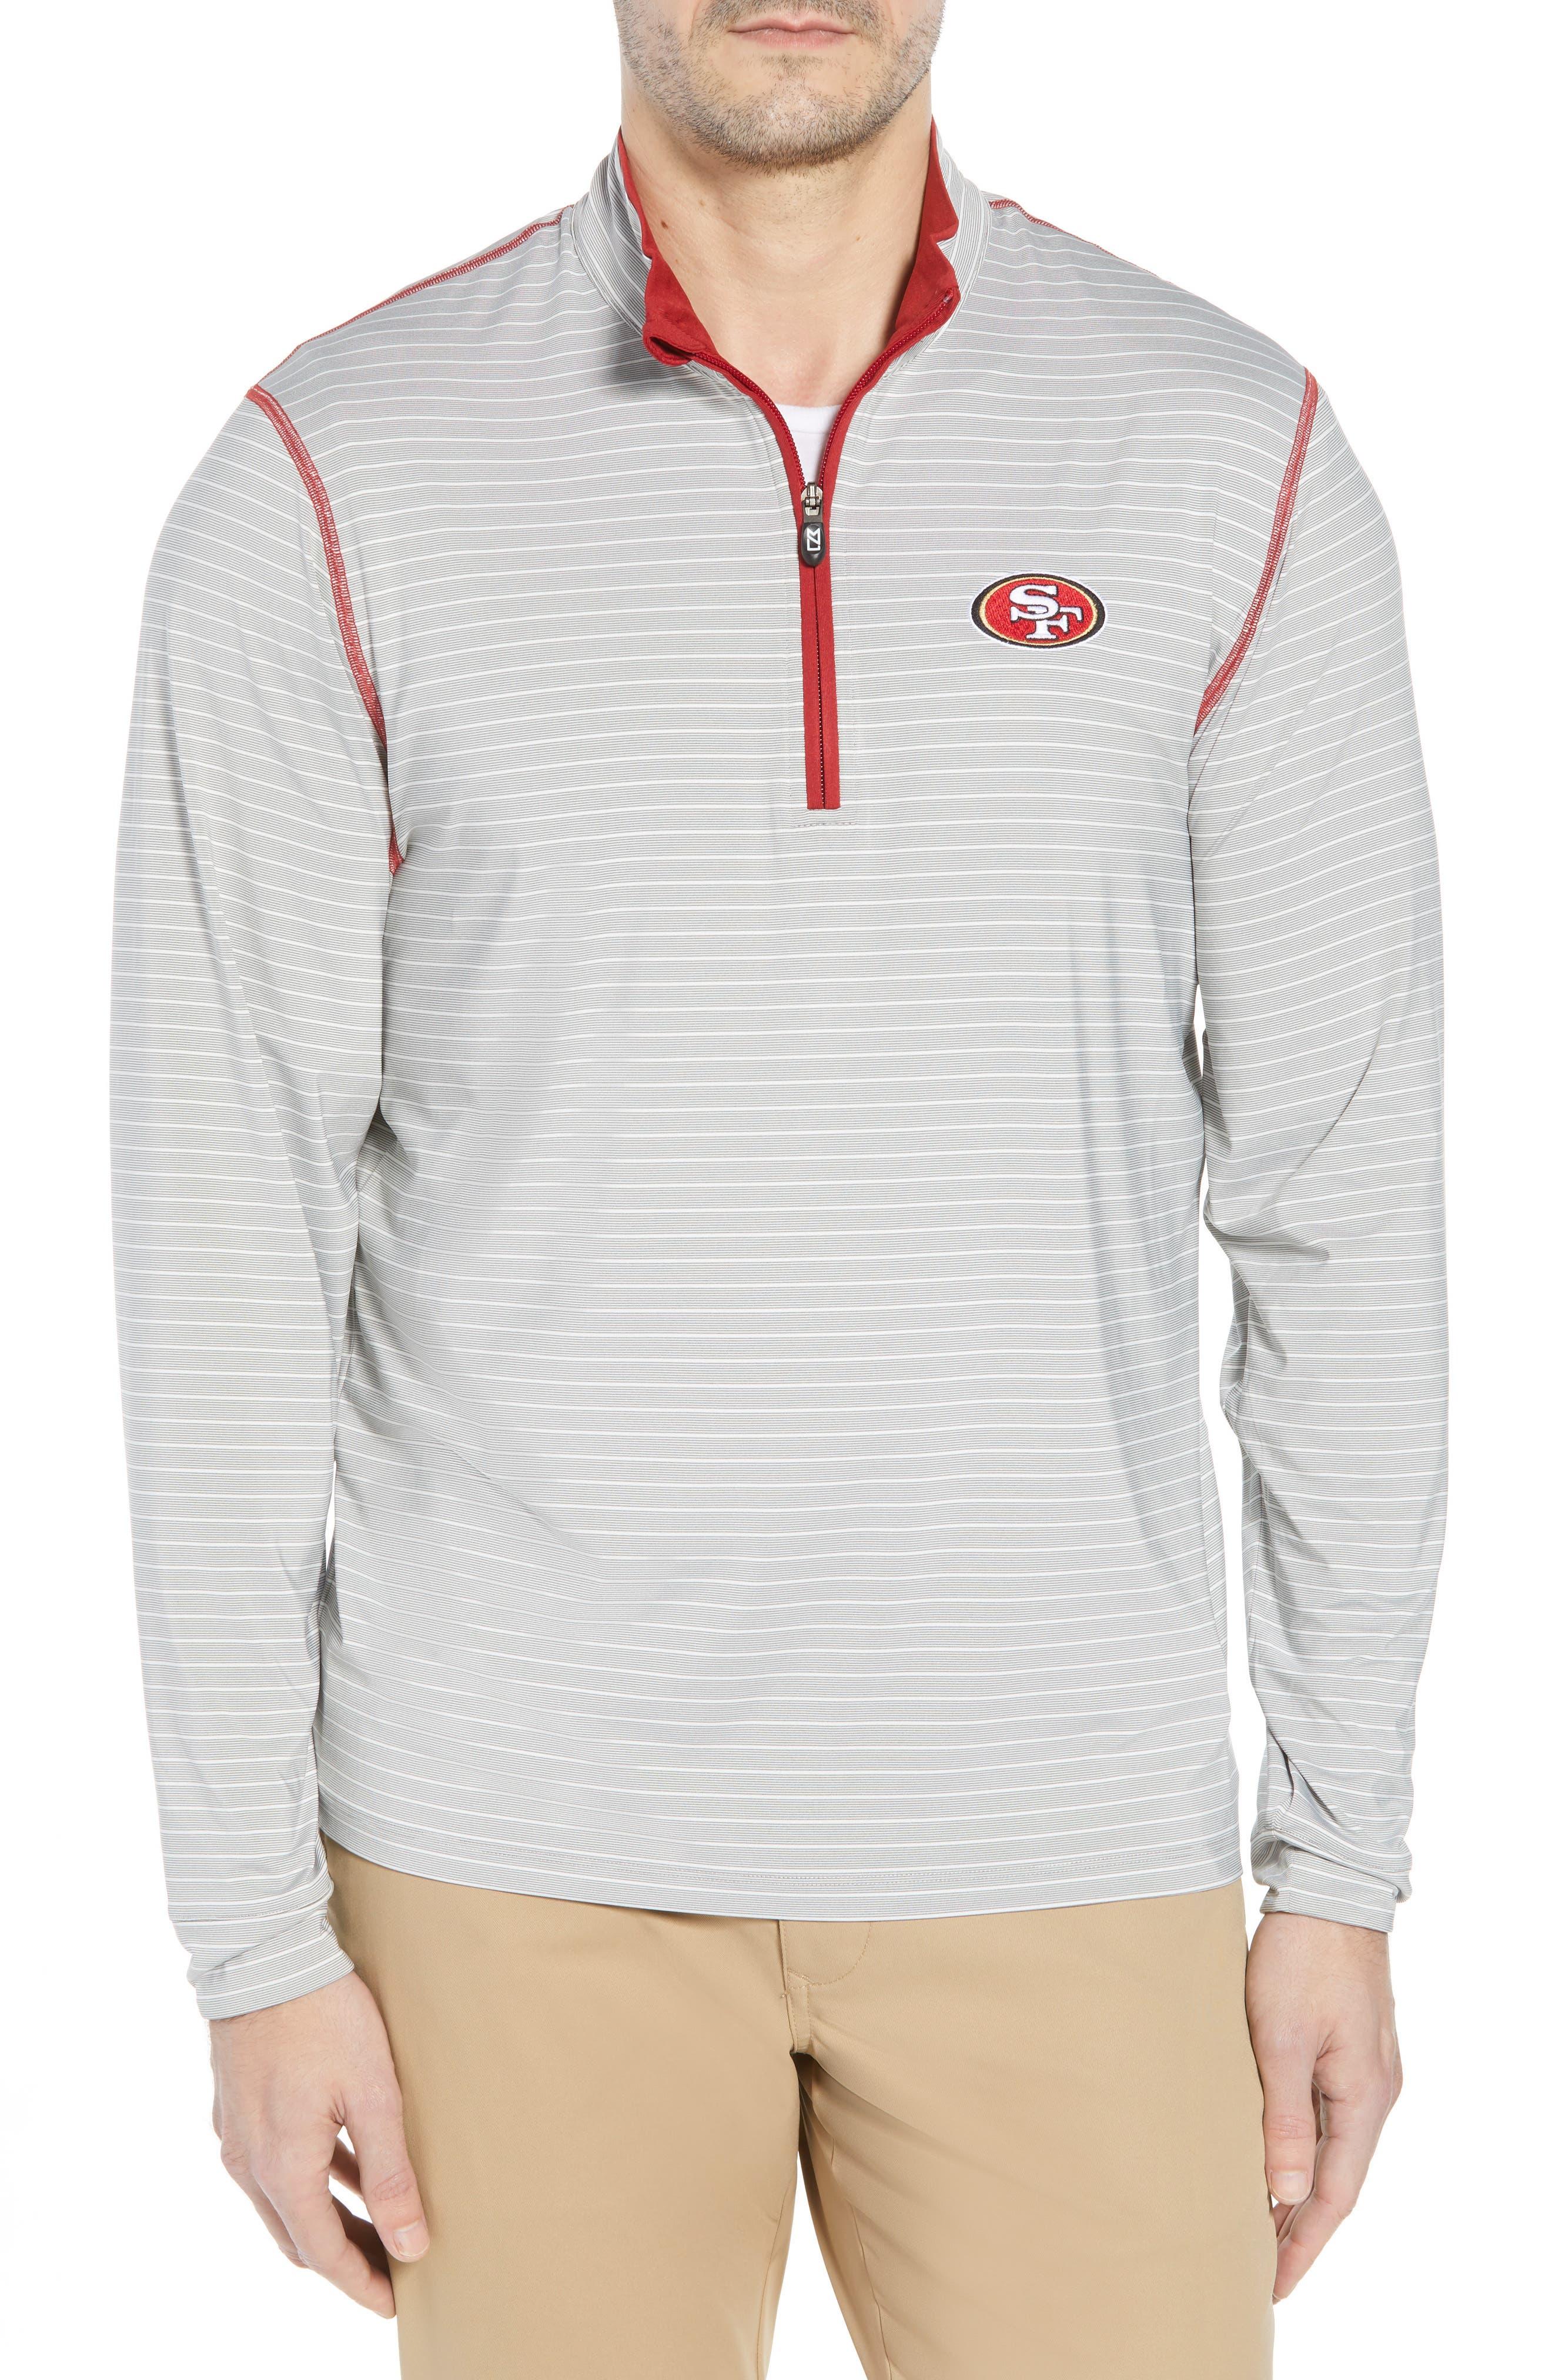 Meridian - San Francisco 49ers Regular Fit Half Zip Pullover,                             Main thumbnail 1, color,                             RED